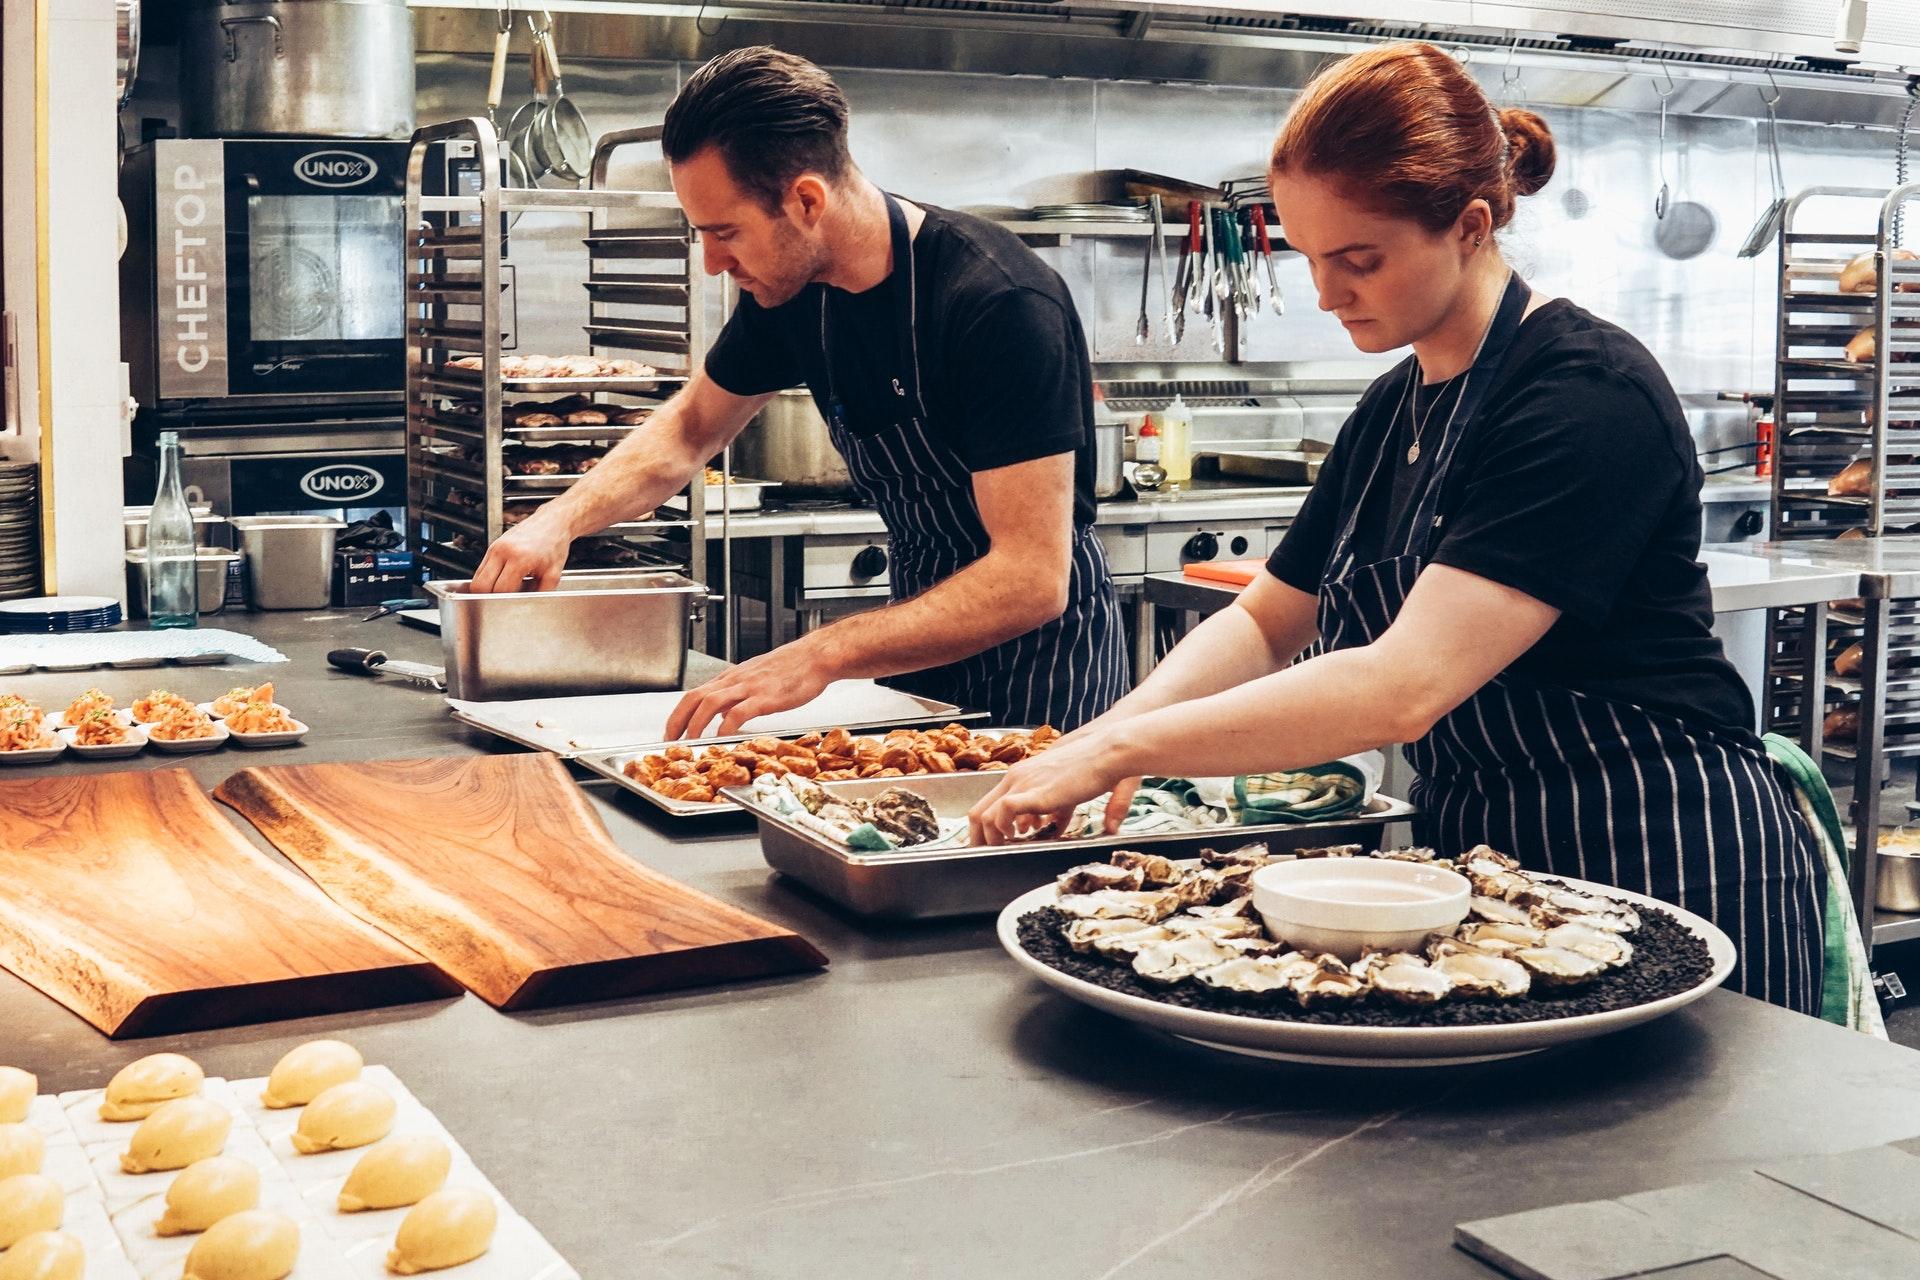 The Essential Industrial Kitchen Cleaning Checklist